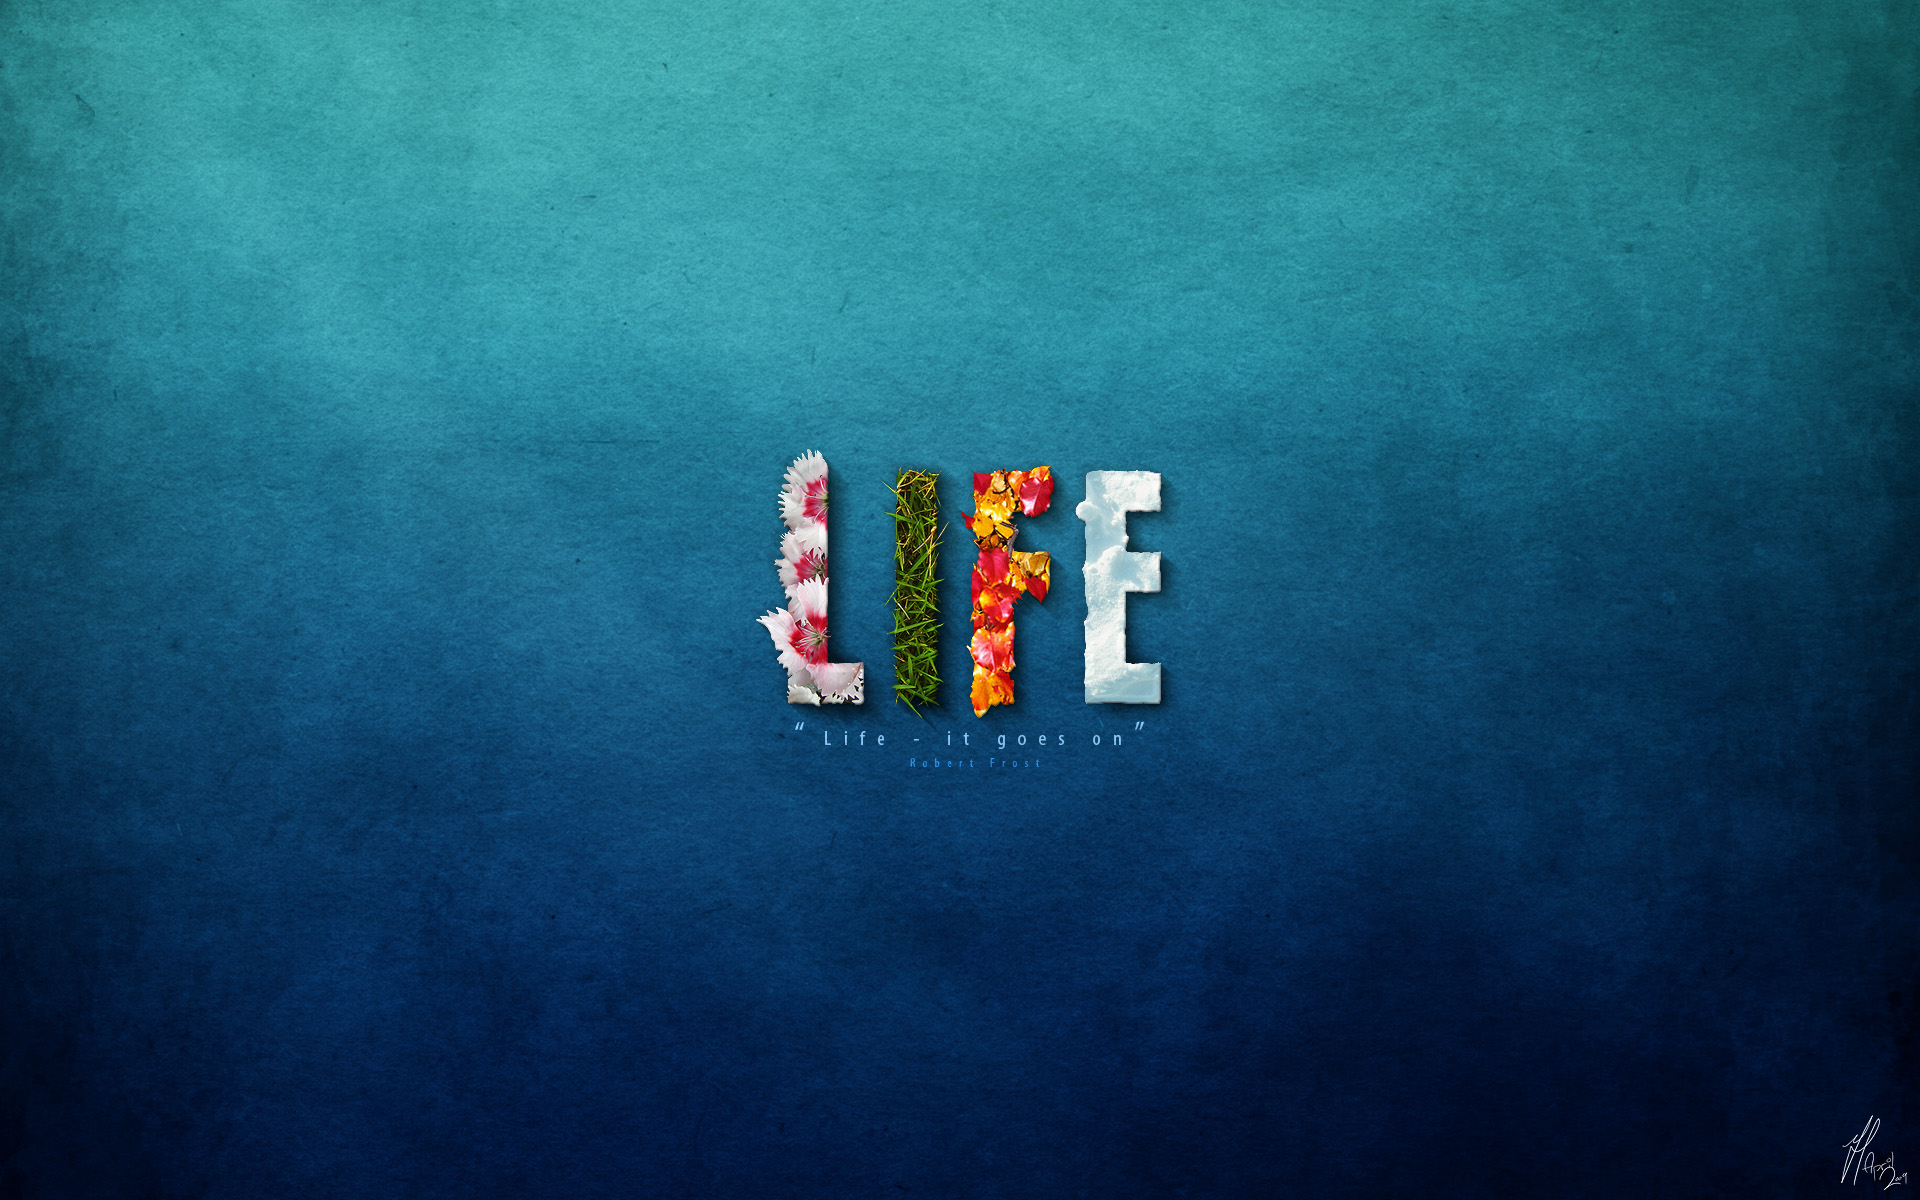 Life_by_mushir-3.jpg